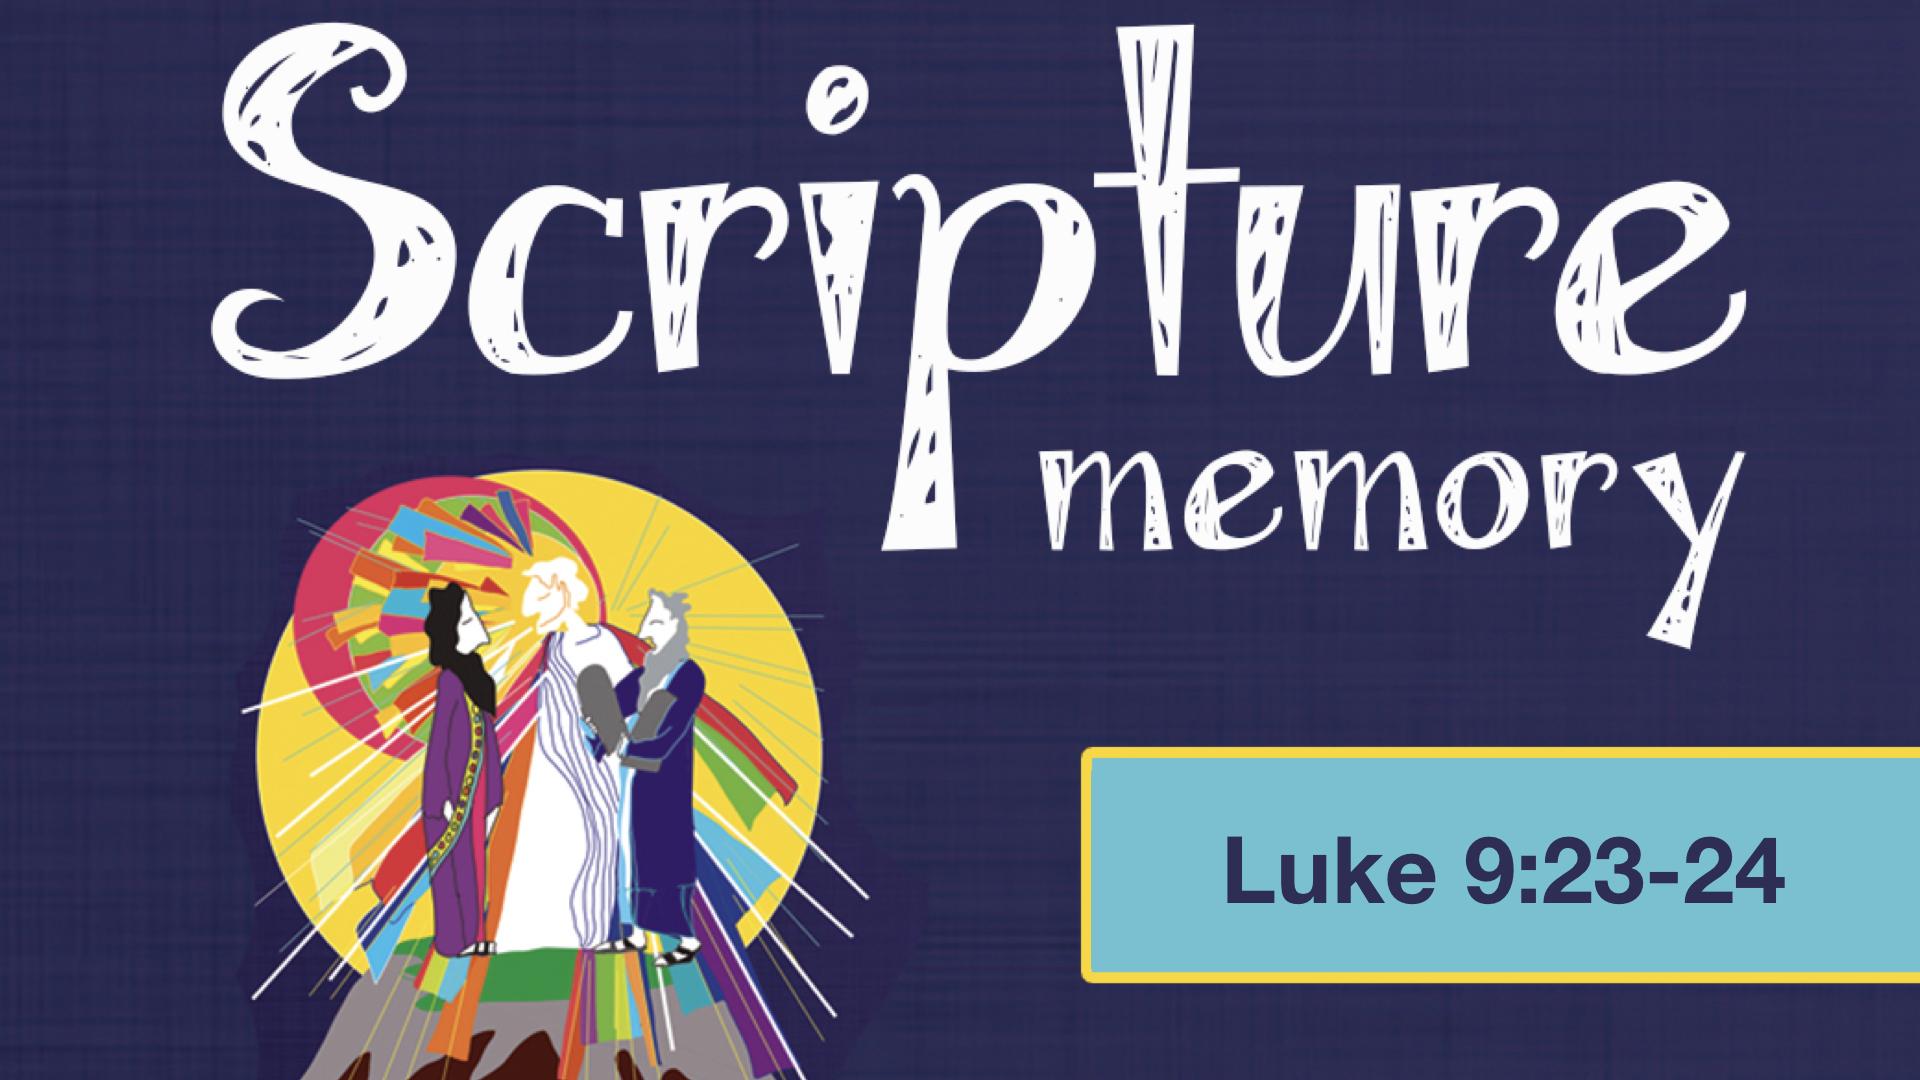 Scripture memory ad_July19.001.jpeg